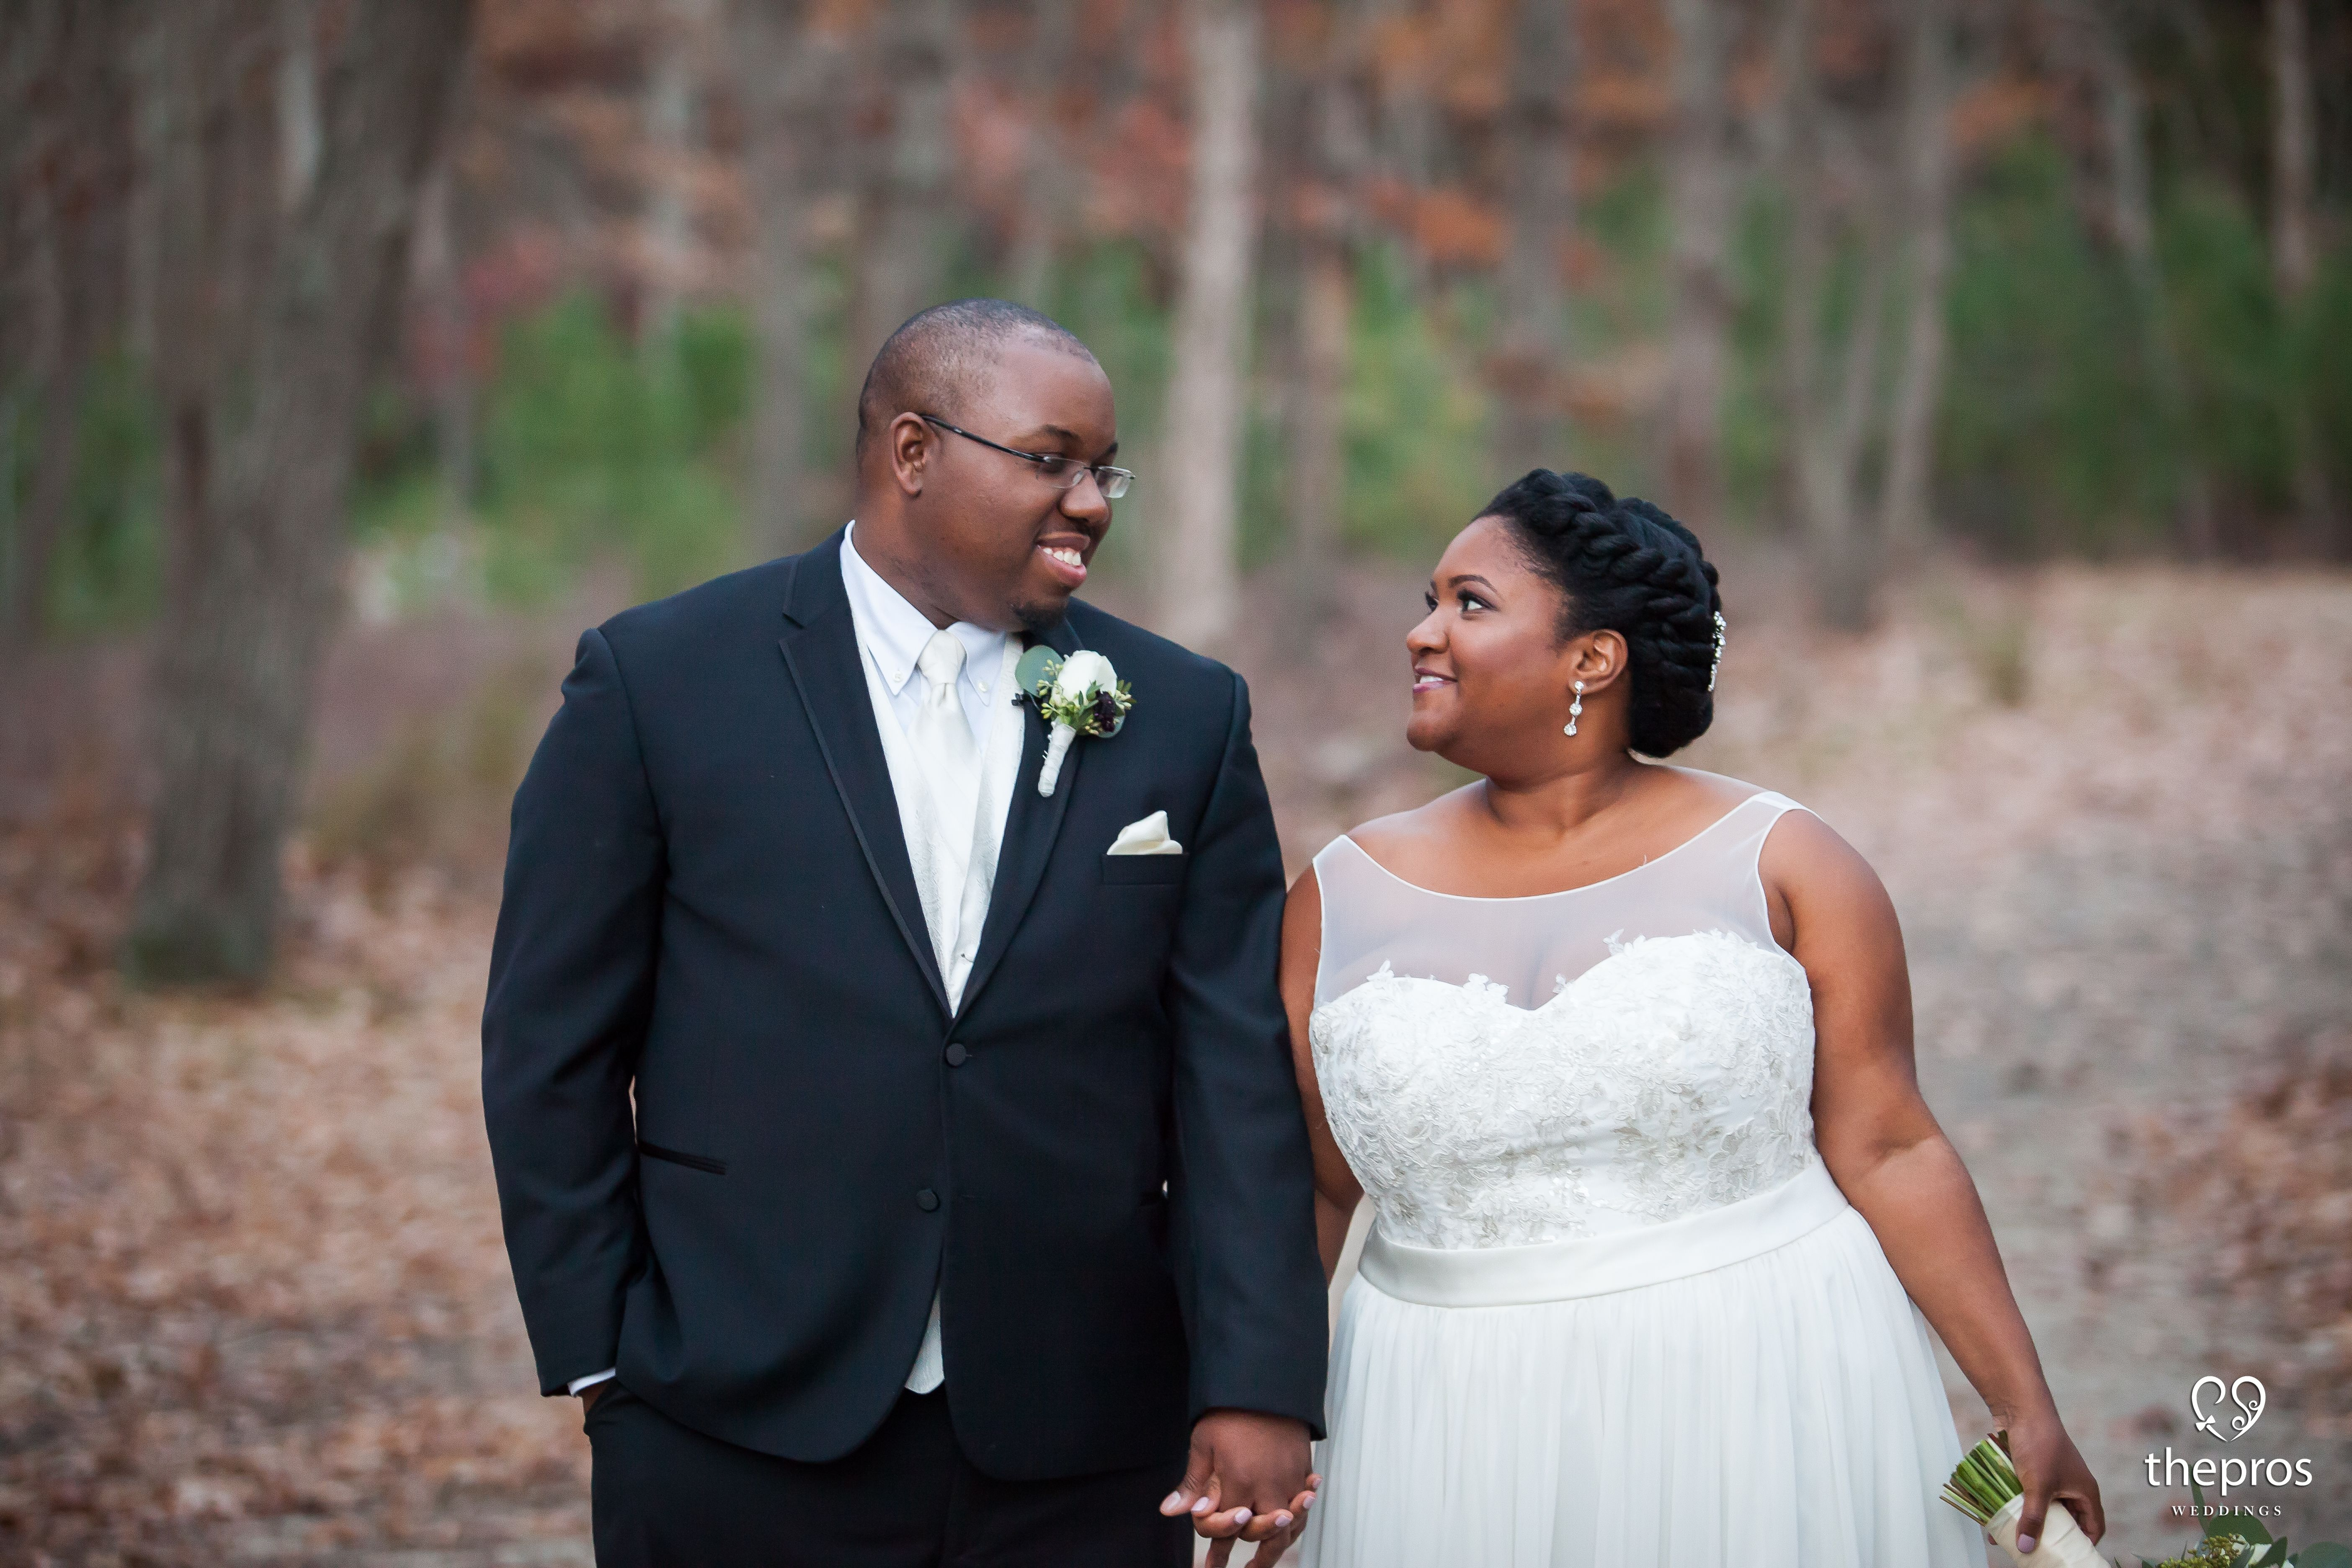 Alisha Milton Say I Do In Galloway Nj Blog The Pros Weddings Wedding Dresses Wedding Real Weddings